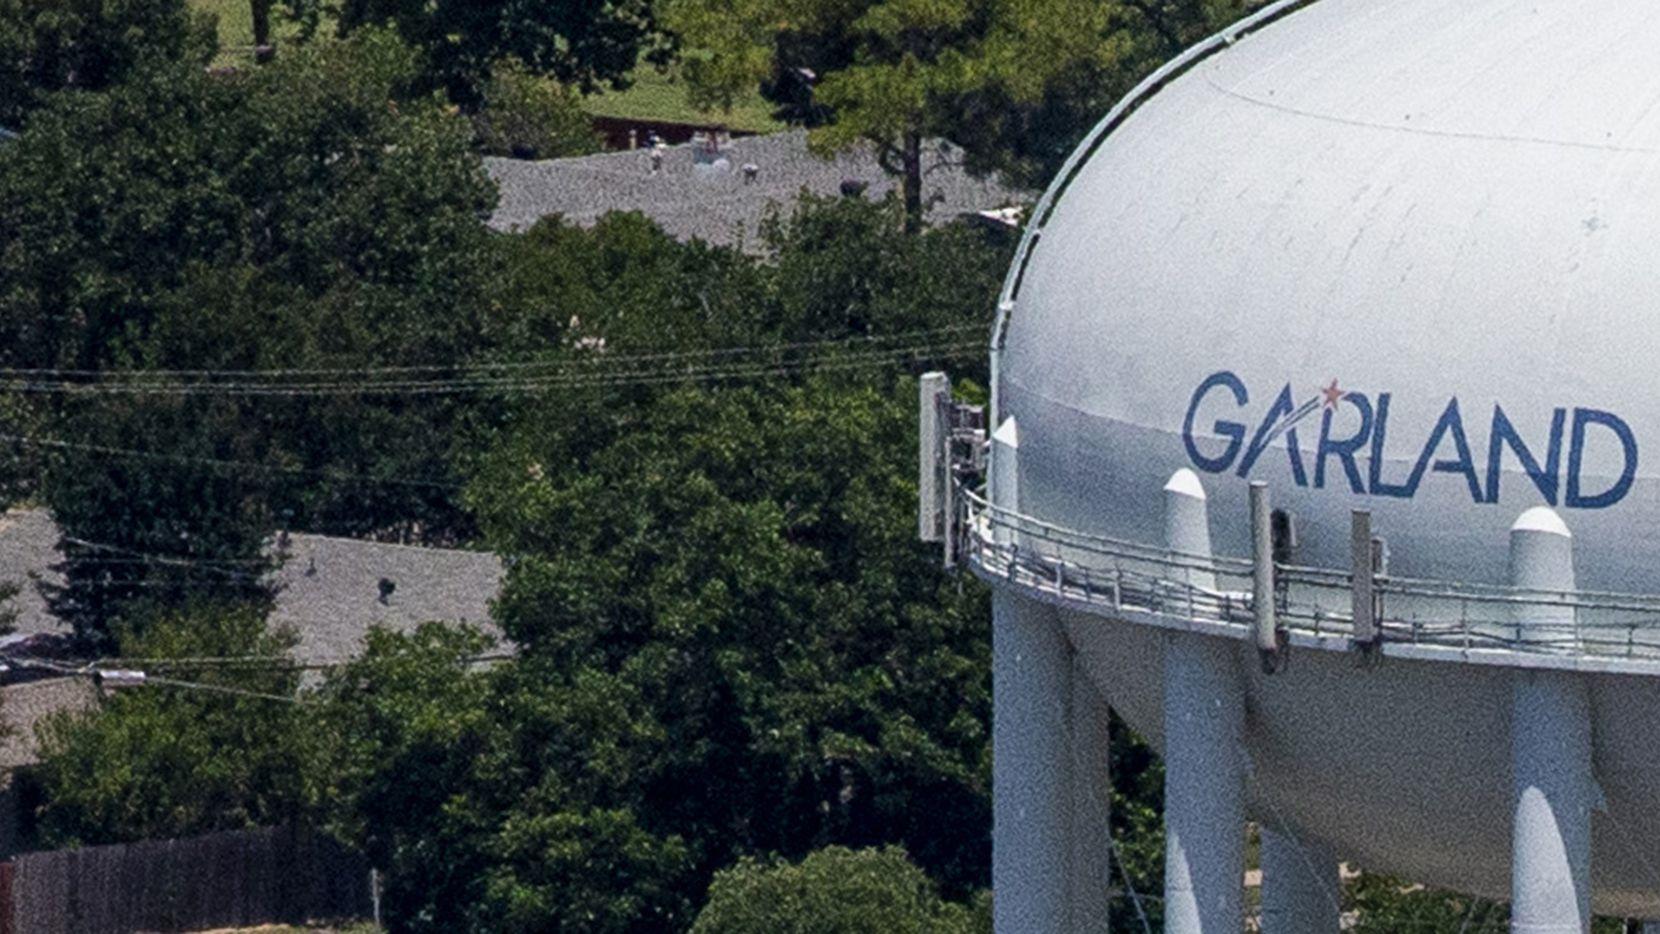 A Garland water tower in Garland, Texas, on Thursday, June 18, 2020. (Lynda M. Gonzalez/The Dallas Morning News)